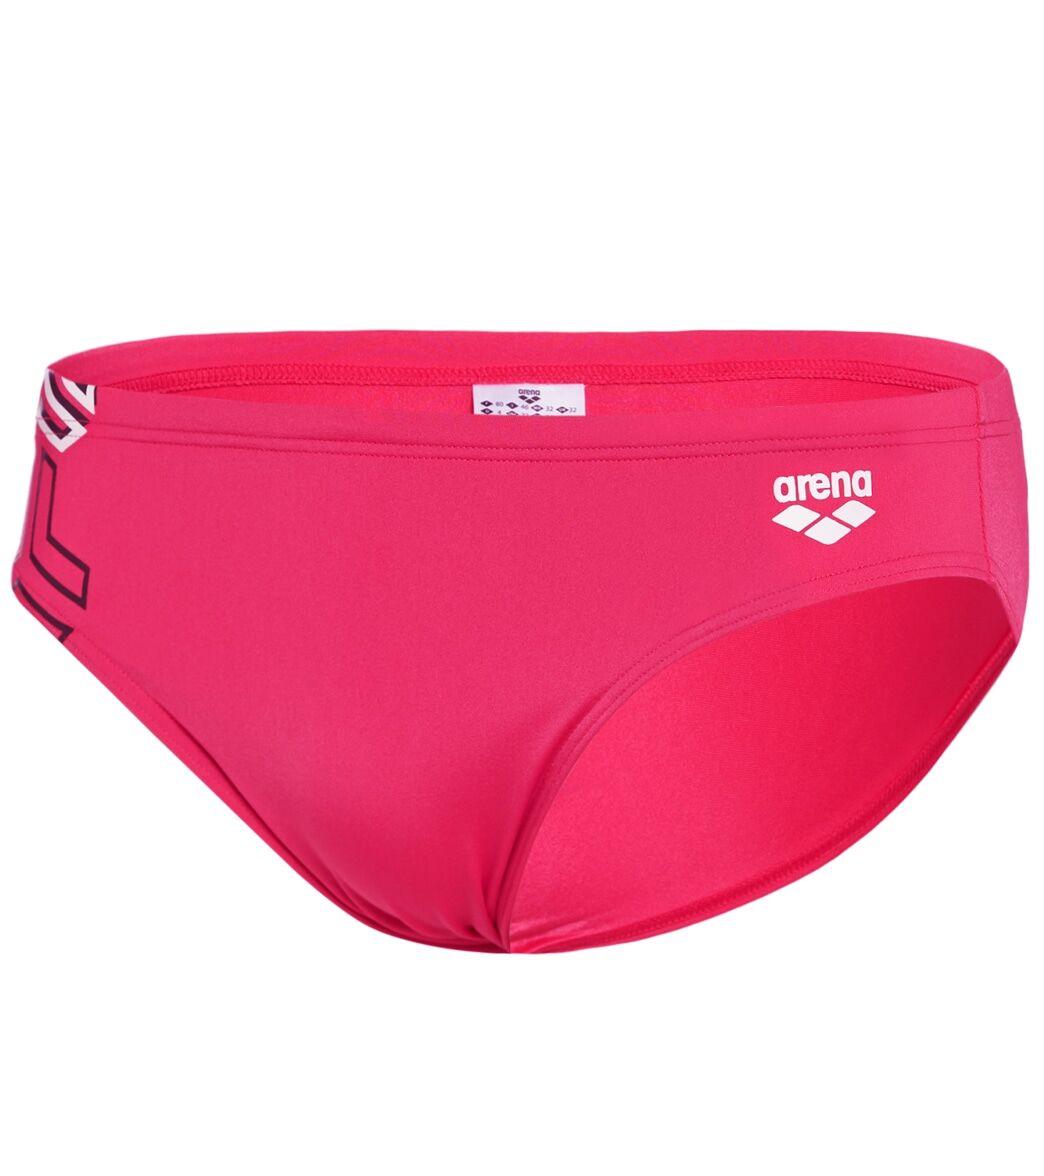 Arena Men's Pink Kikko Brief Swimsuit - Freak Rose 22 - Swimoutlet.com